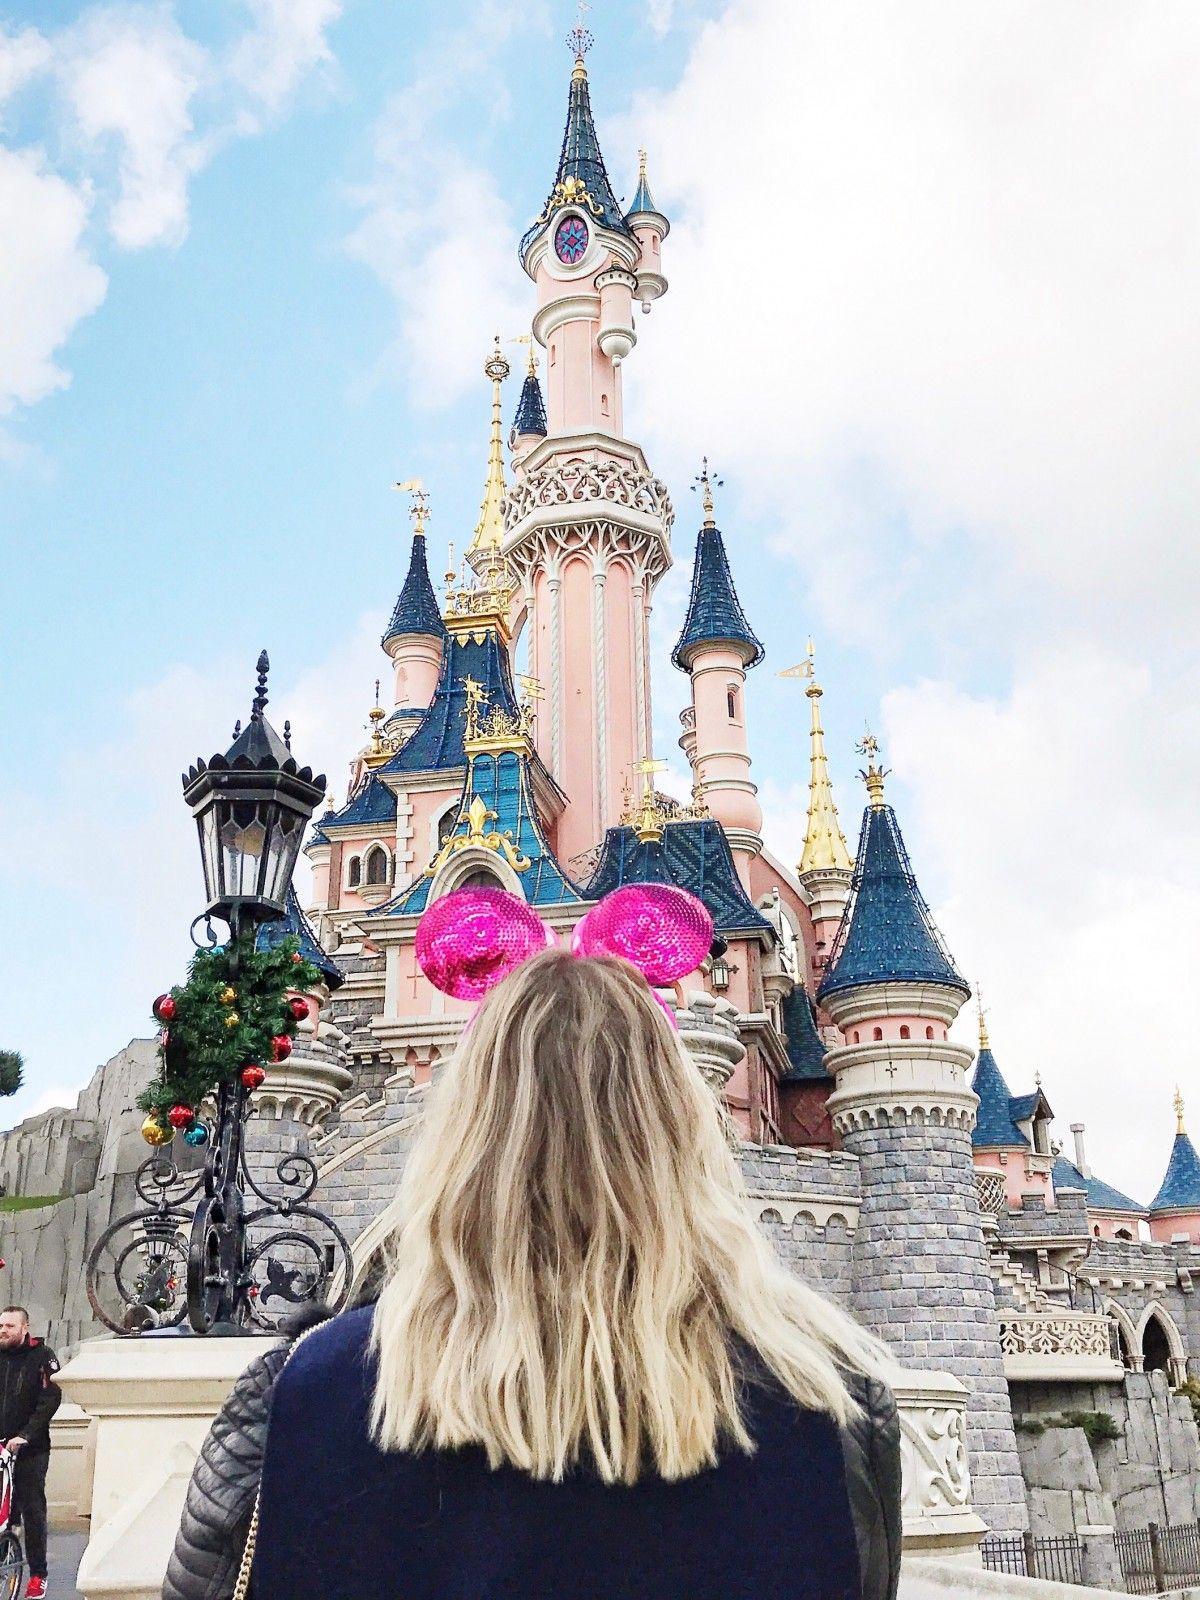 11 Tips For Visiting Disneyland Paris As A Grown-Up